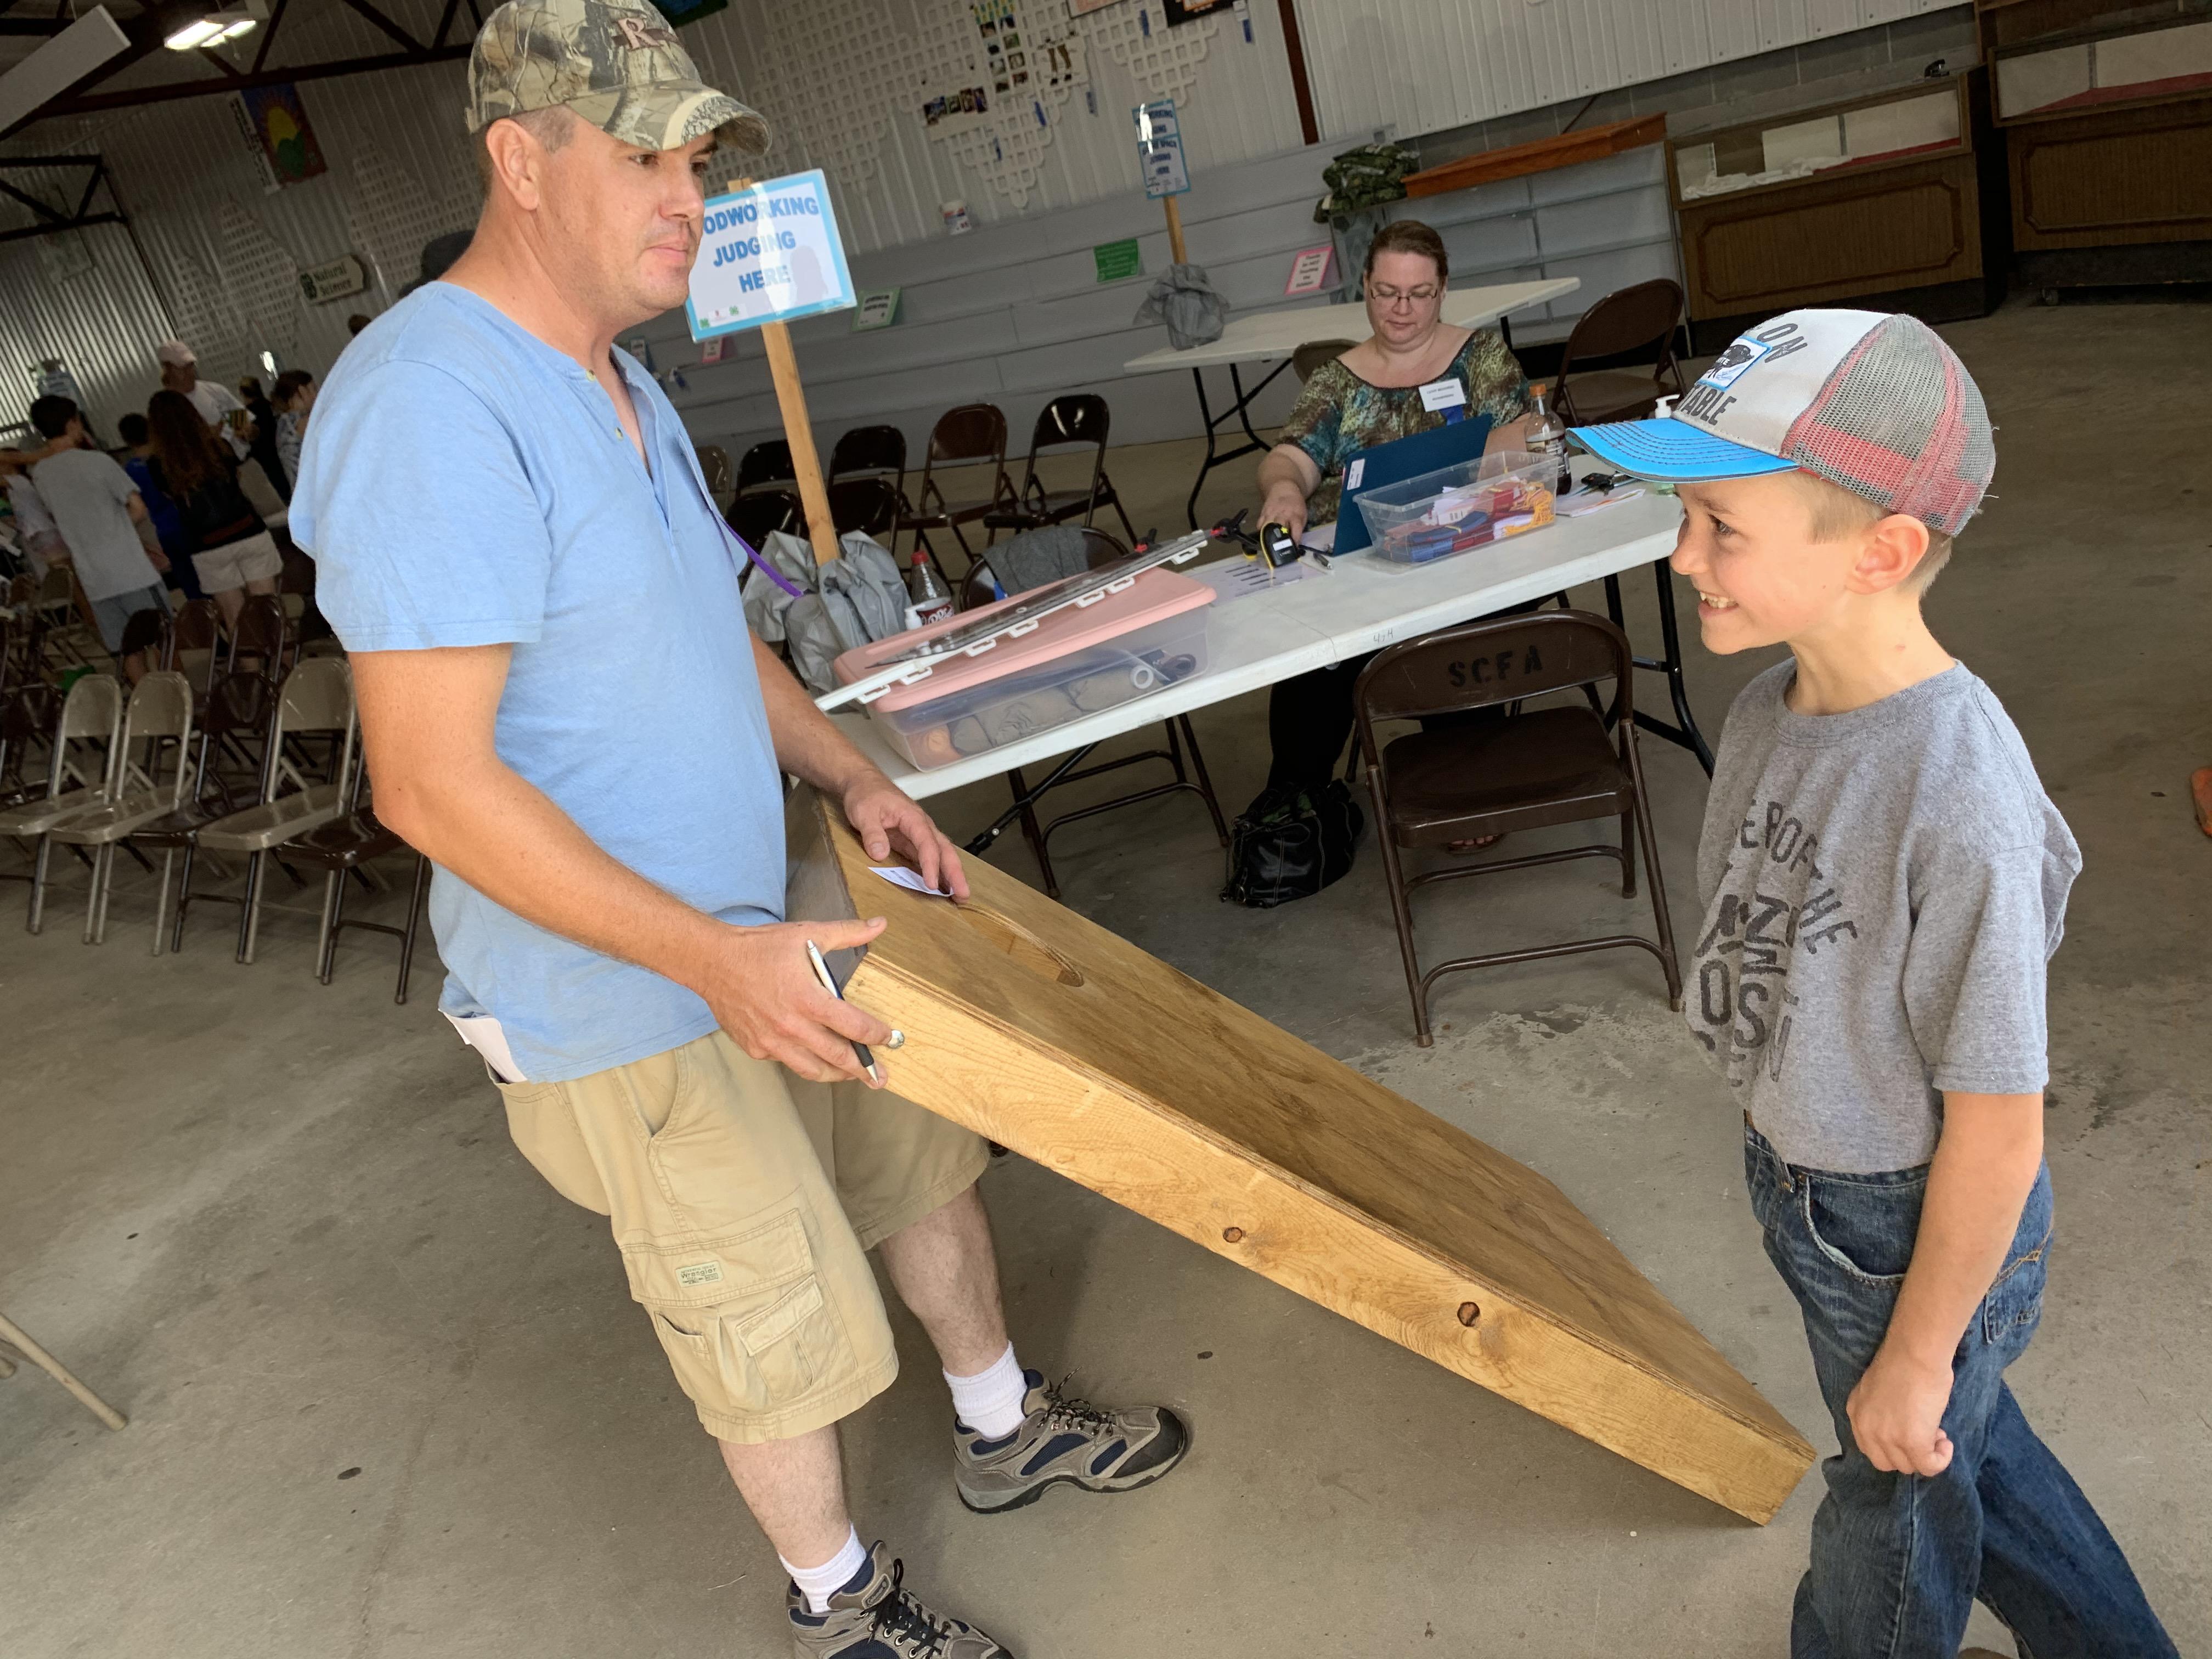 Judge David Bork, left, examines Cecil resident Trevor Bohn's bean bag board at the woodworking booth in the Shawano Fairgrounds' 4-H barn Aug. 28.(Luke Reimer   NEW Media)